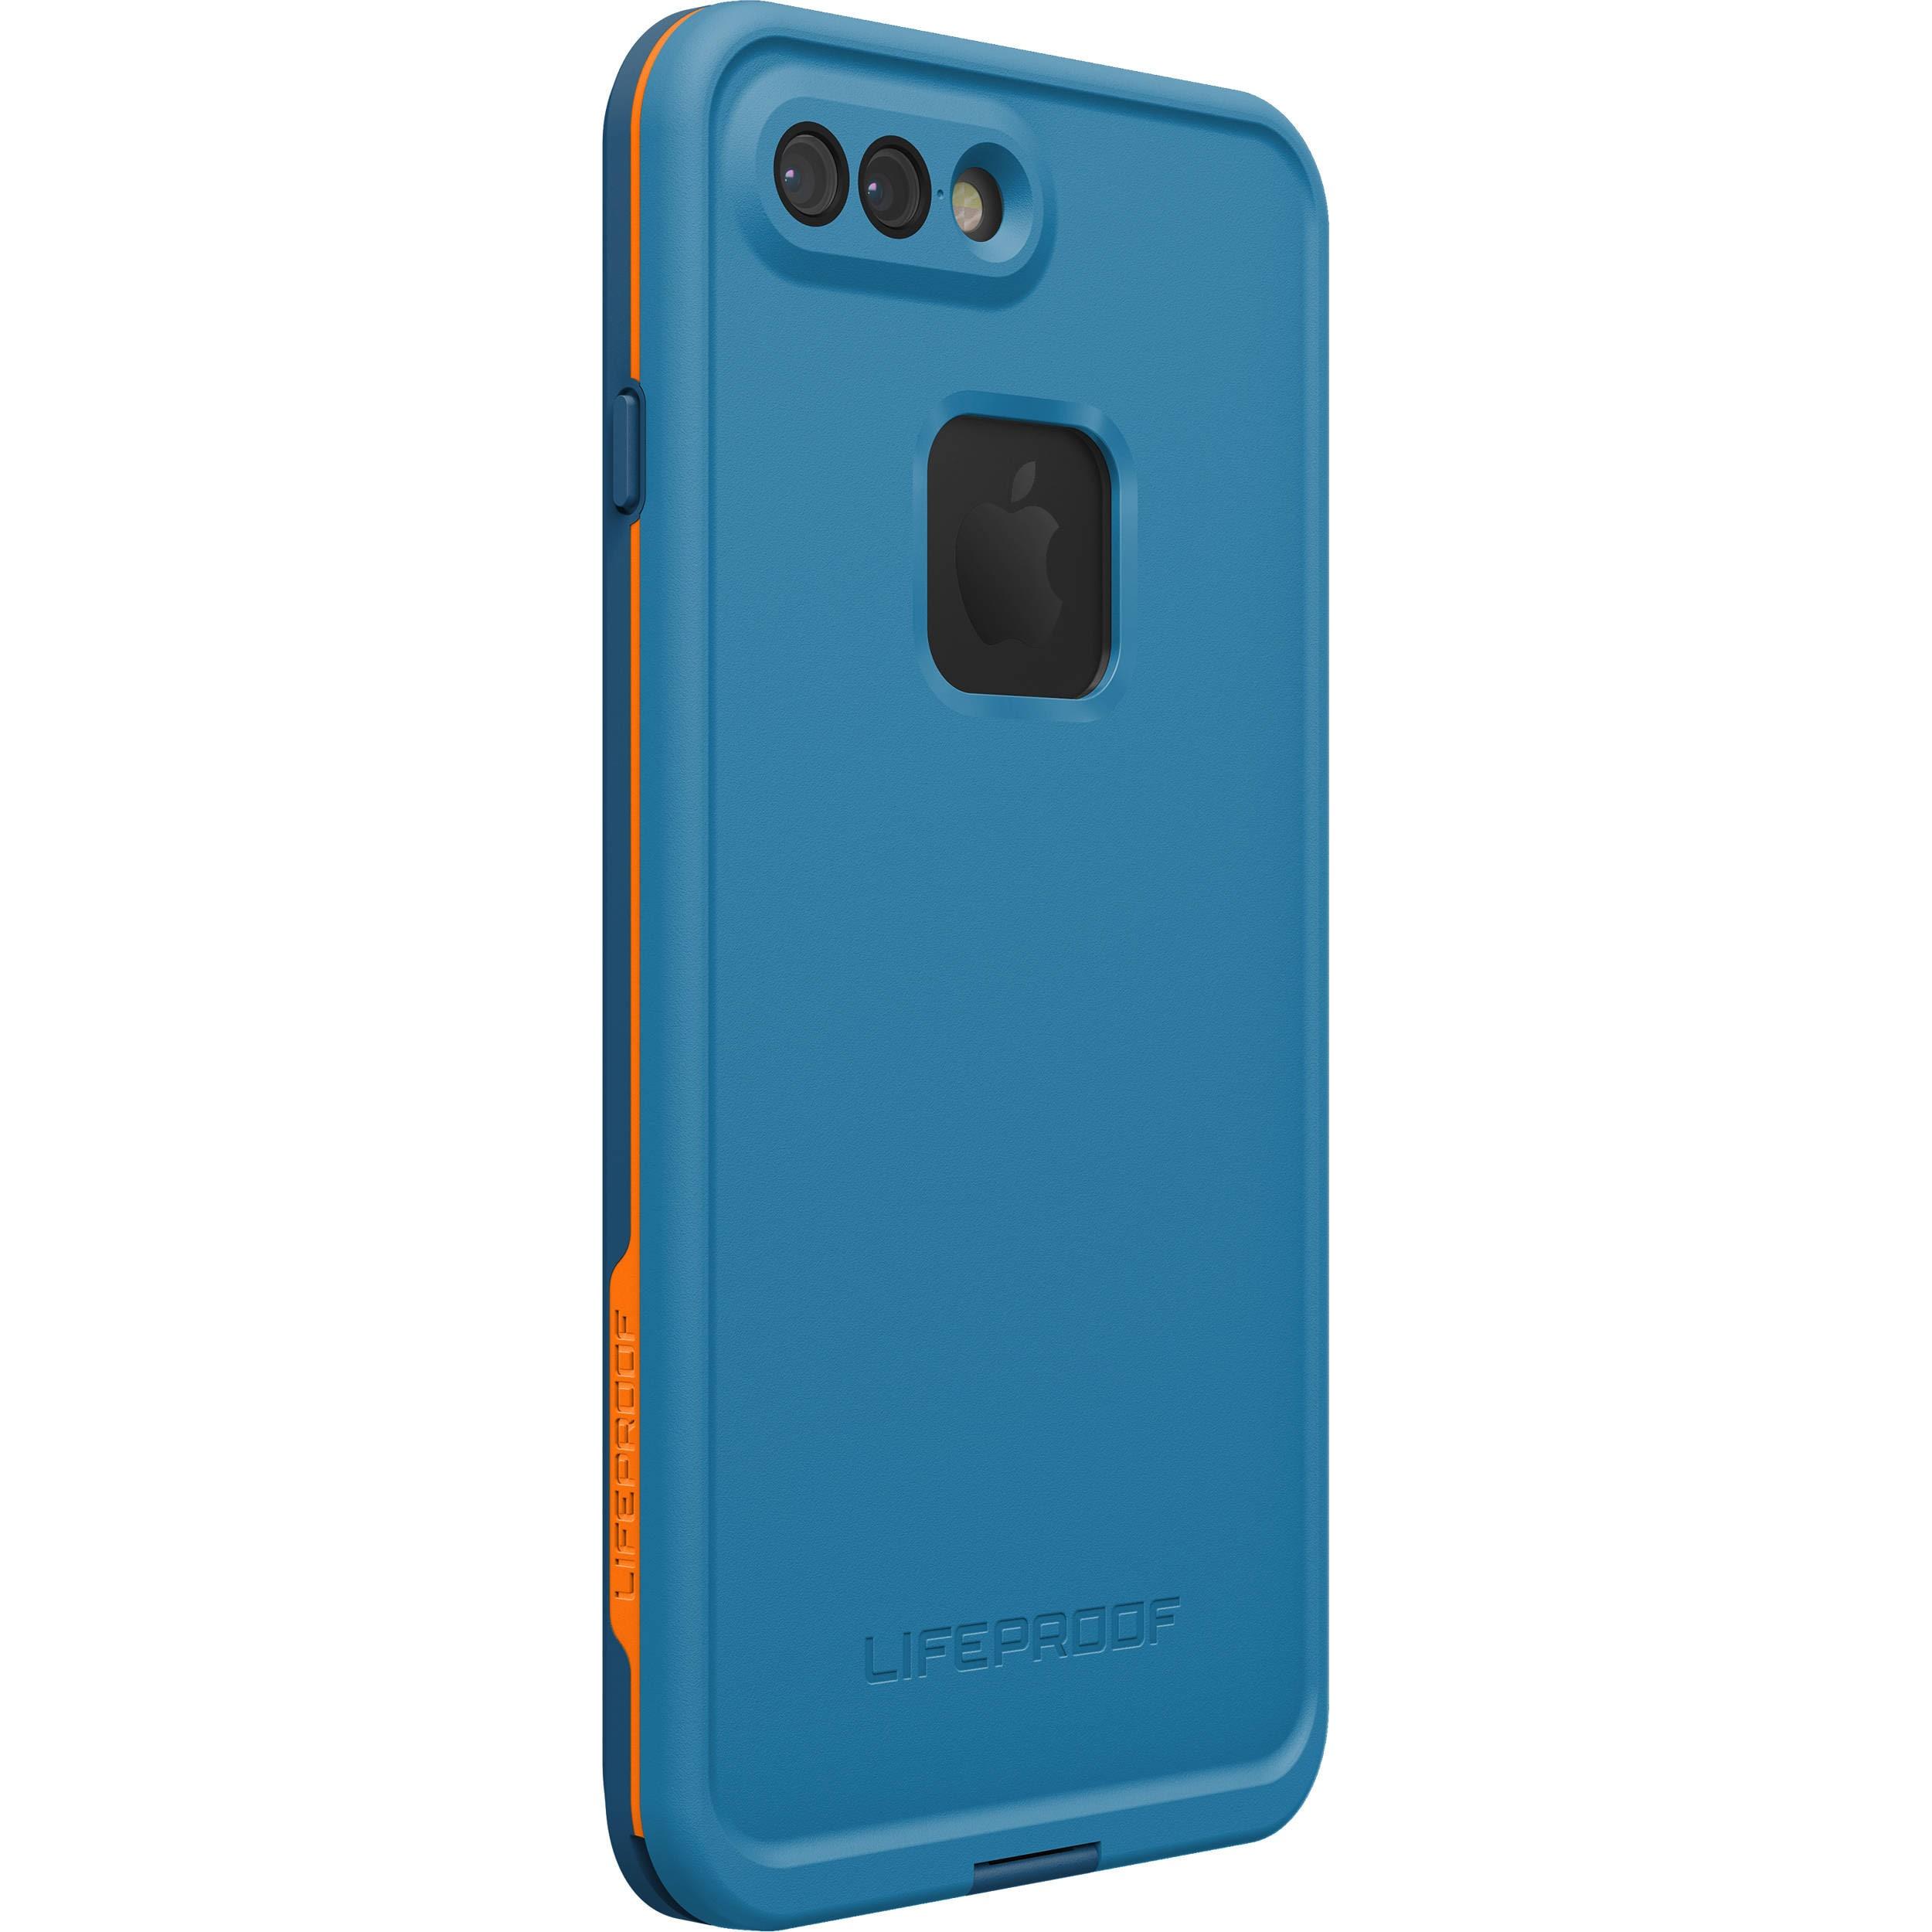 competitive price 0b7df c9f1a LifeProof Fre Waterproof Case for iPhone 7 Plus - Base Camp Blue TWPP  (COWABUNGA BLUE/WAVE CRASH/MANGO TANGO)